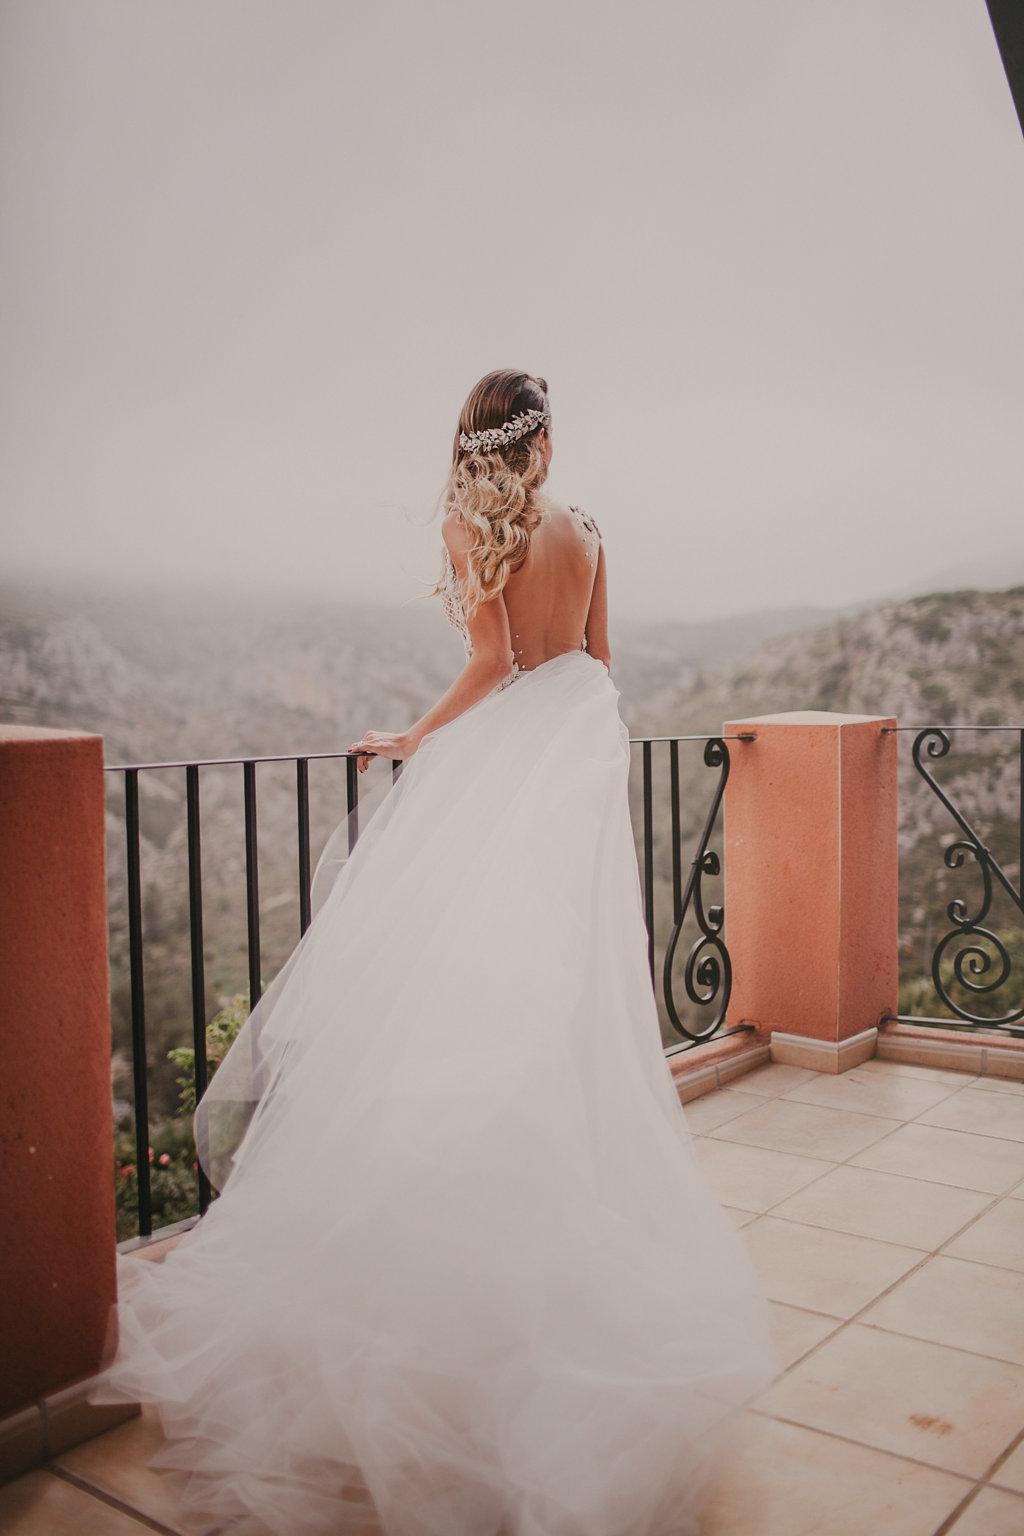 Boda alicante vestido novia Ruben Hernandez